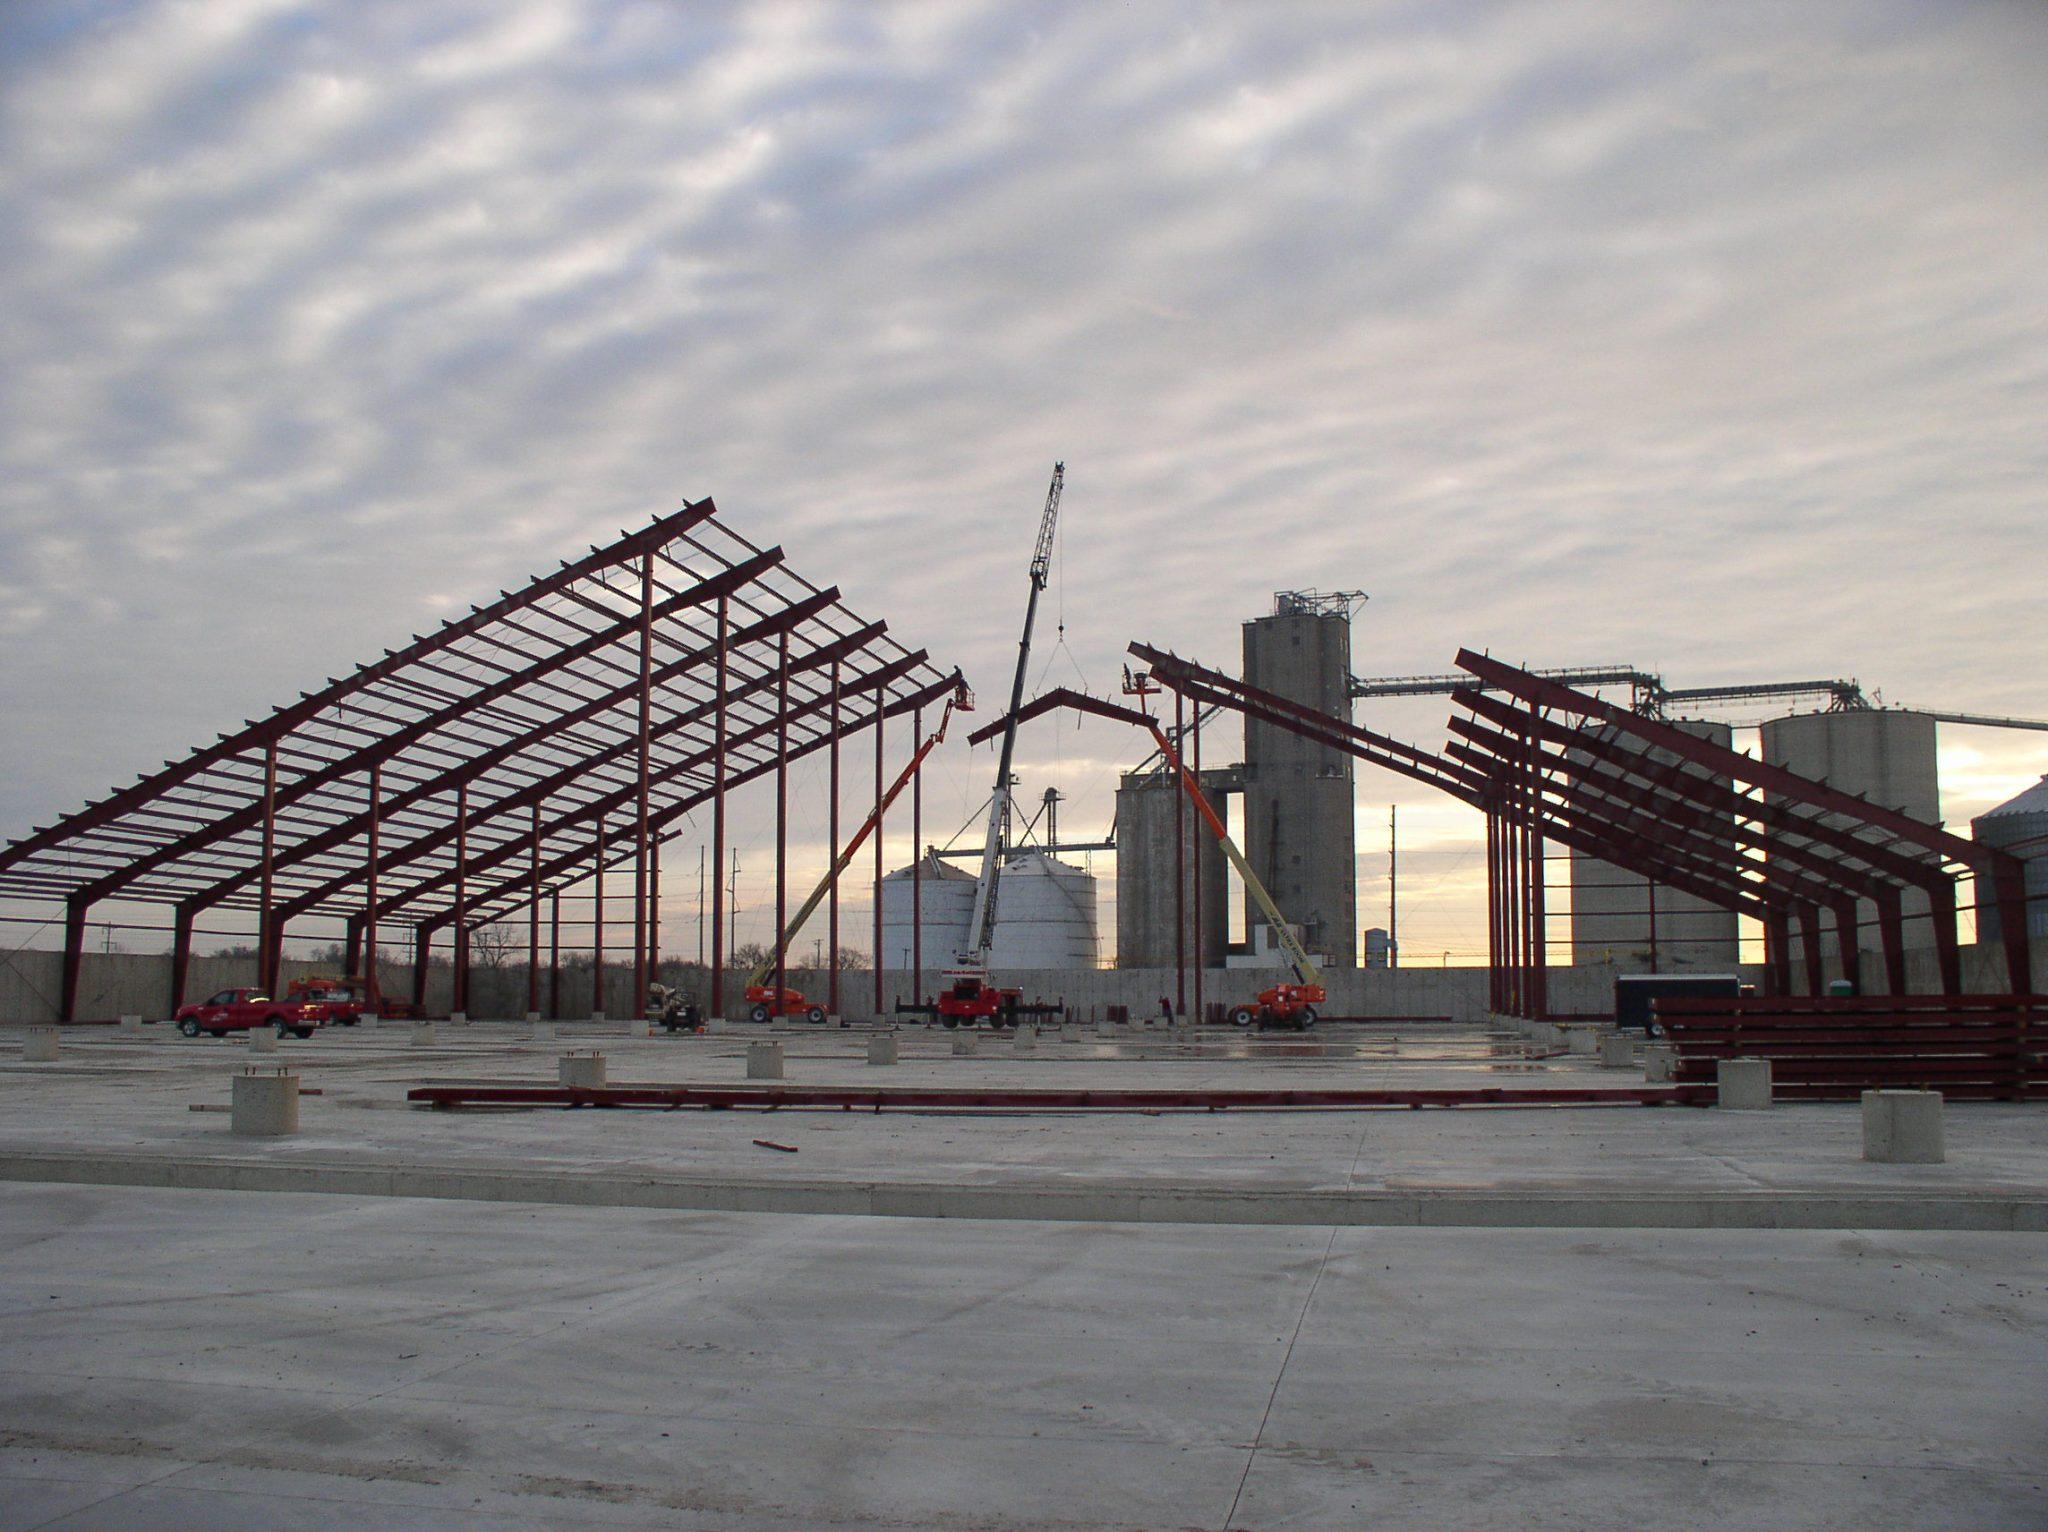 Cargill Grain Facility